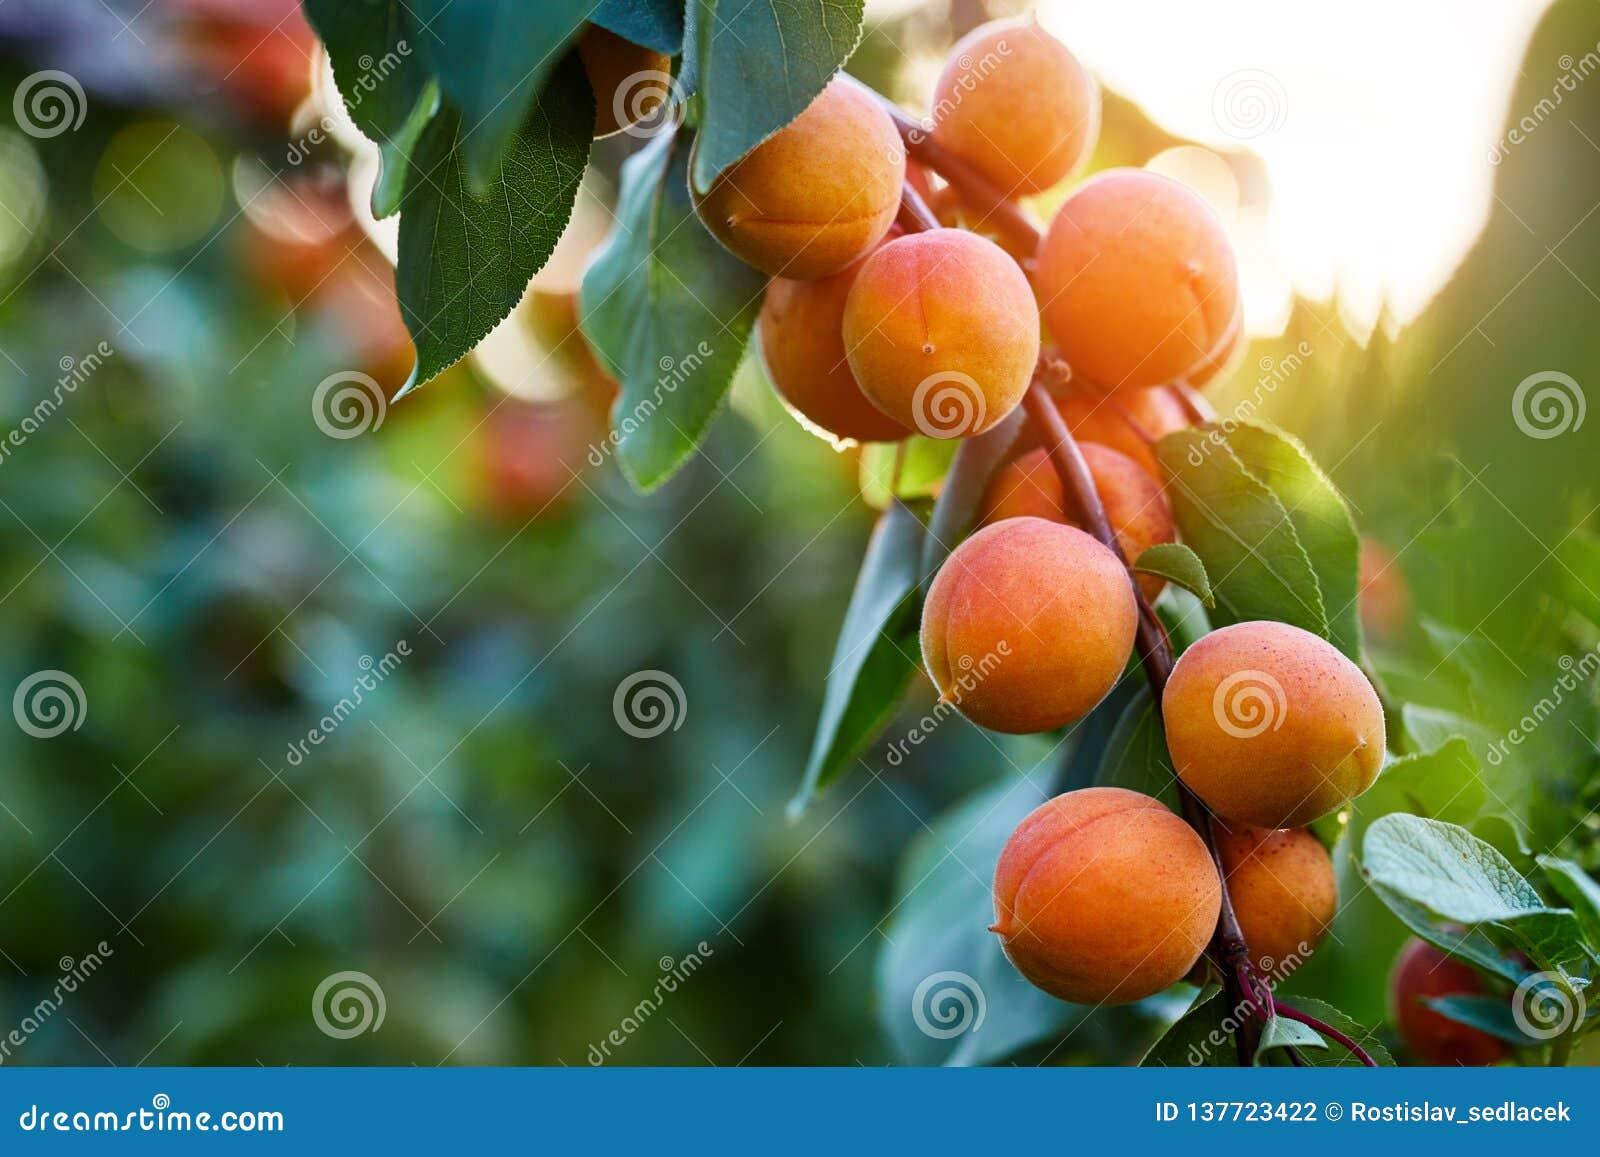 Ripe apricots branch in sunlight